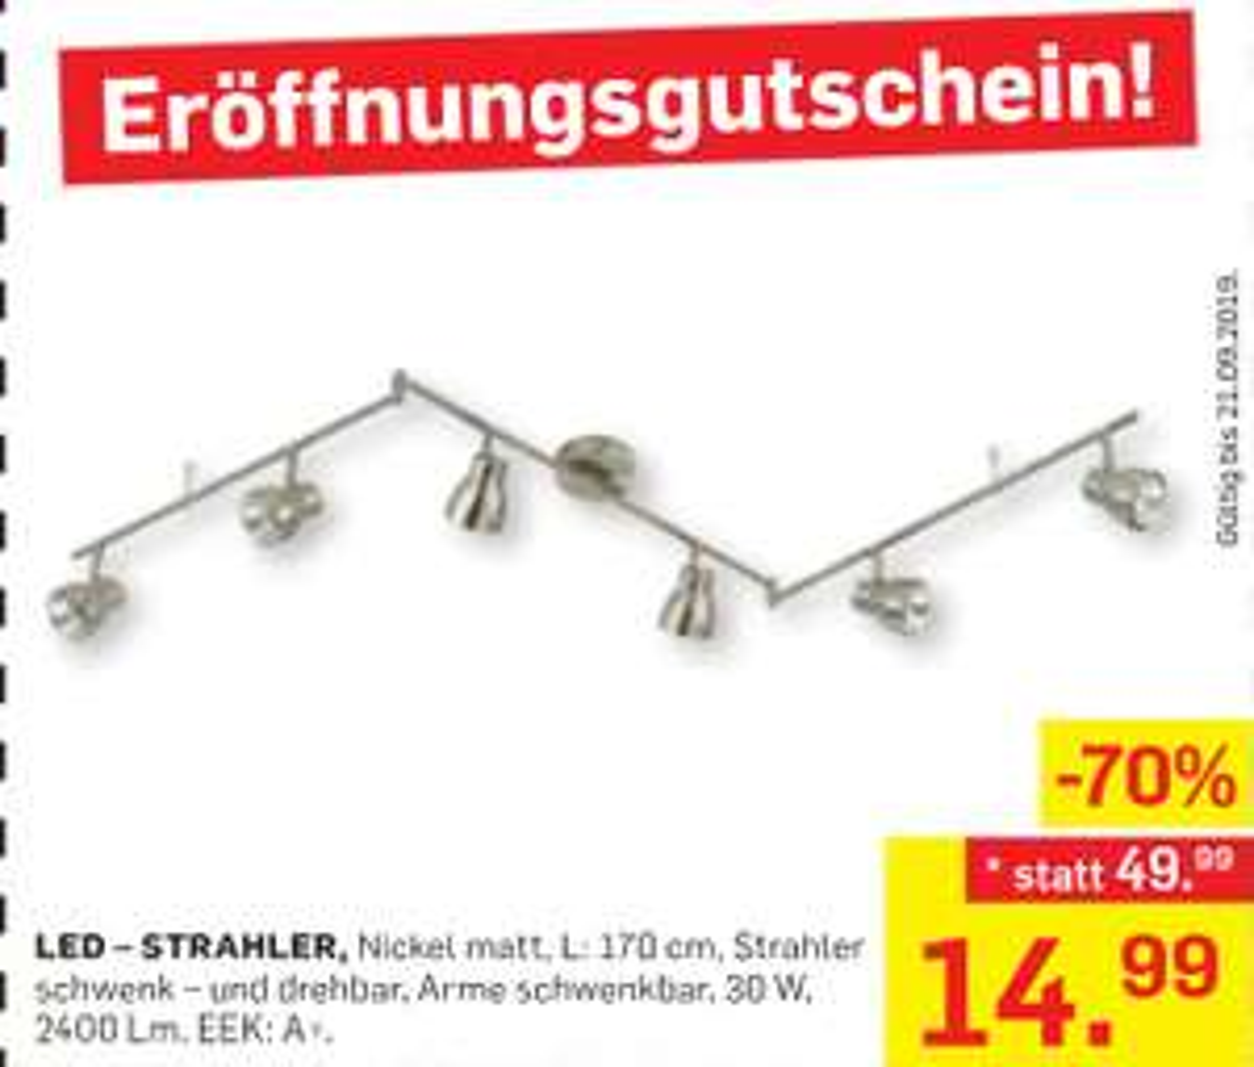 [Möbel Ludwig] Eröffnungsangebot: LED Strahler schwenkbar ink. 6 Led's, 5 Jahre Garantie um nur 14,99€